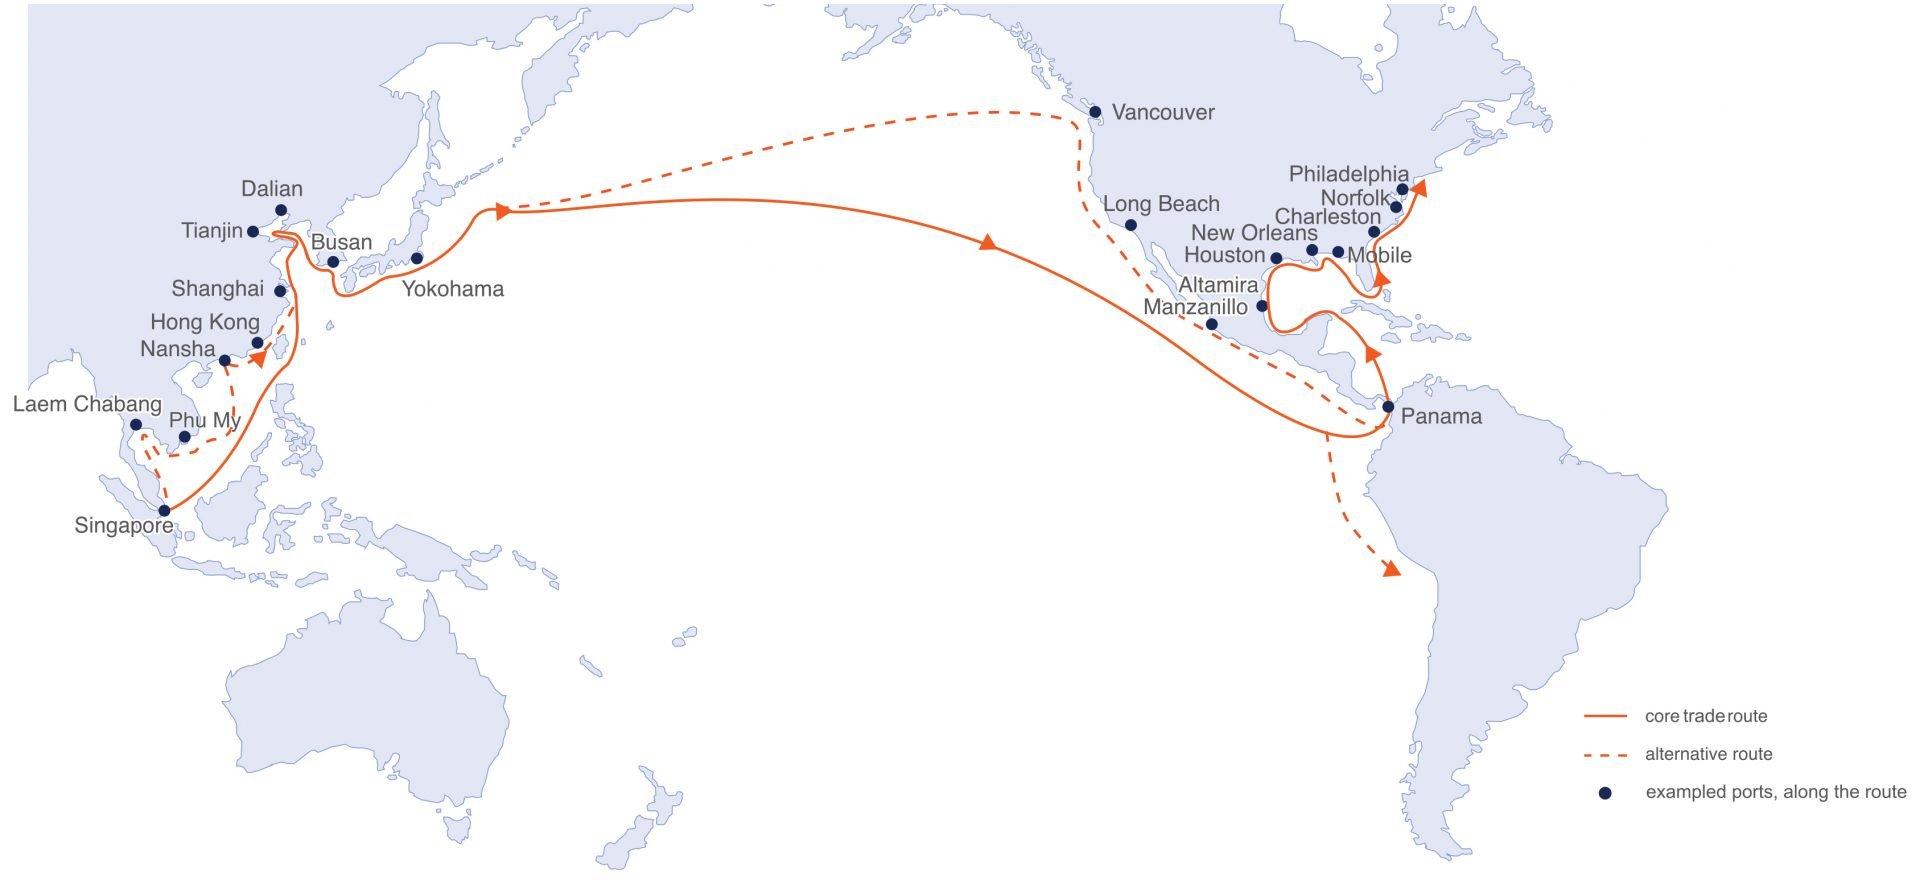 ASIA – AMERICAS TRADE ROUTES SAILINGS (27.04.21)